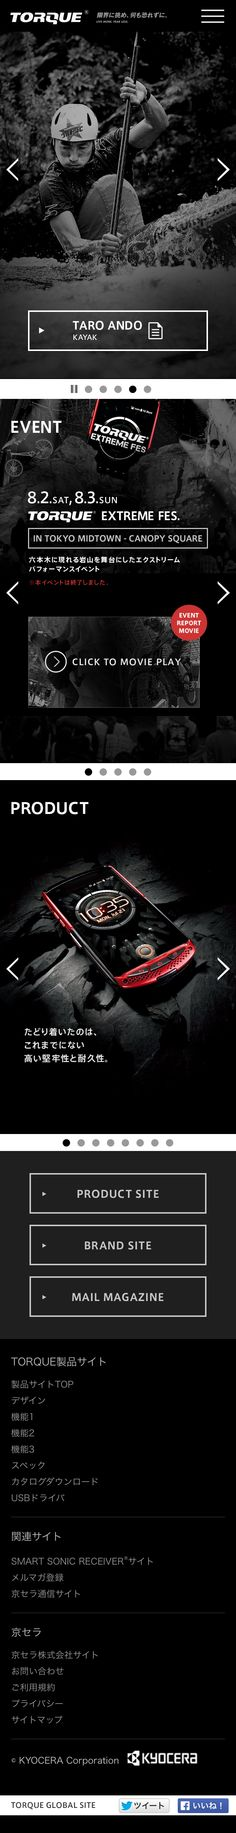 http://www.kyocera.co.jp/prdct/telecom/consumer/g01/special/